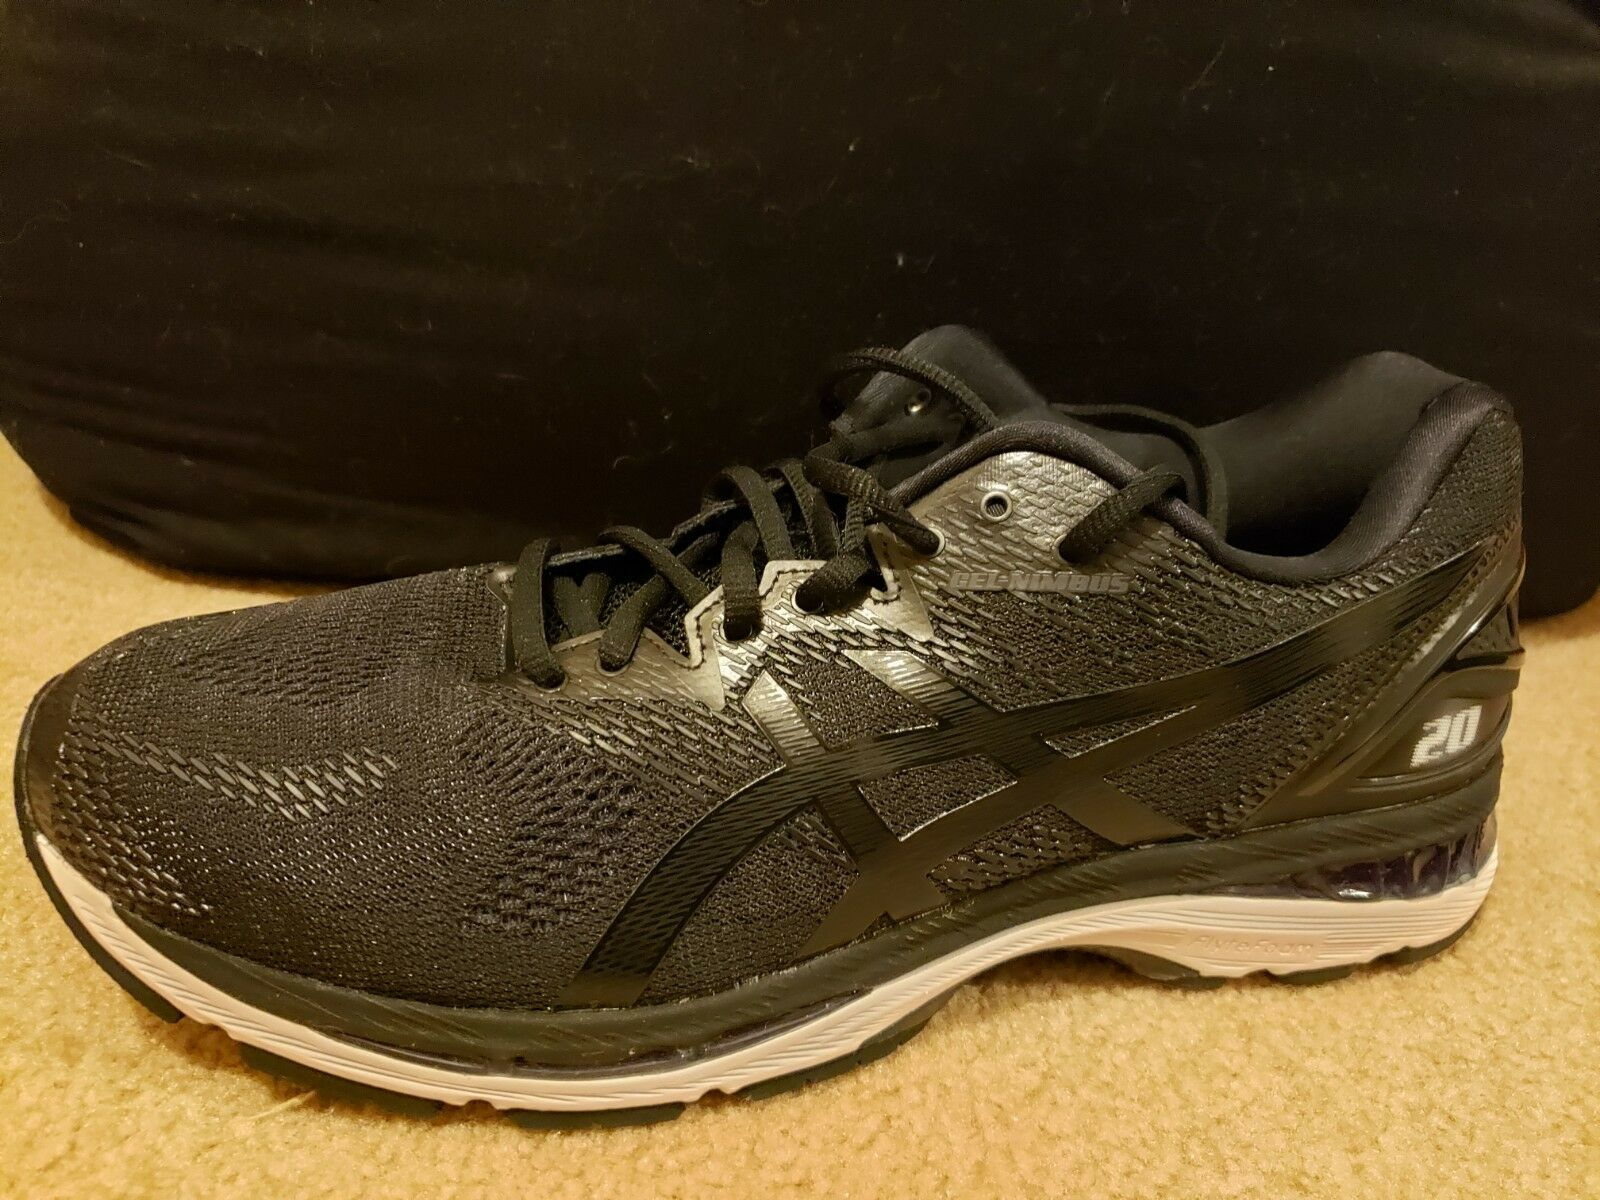 6fe5a289e6a Asics Men s Running shoes Gel-Nimbus 20 (2E-Extra Wide)